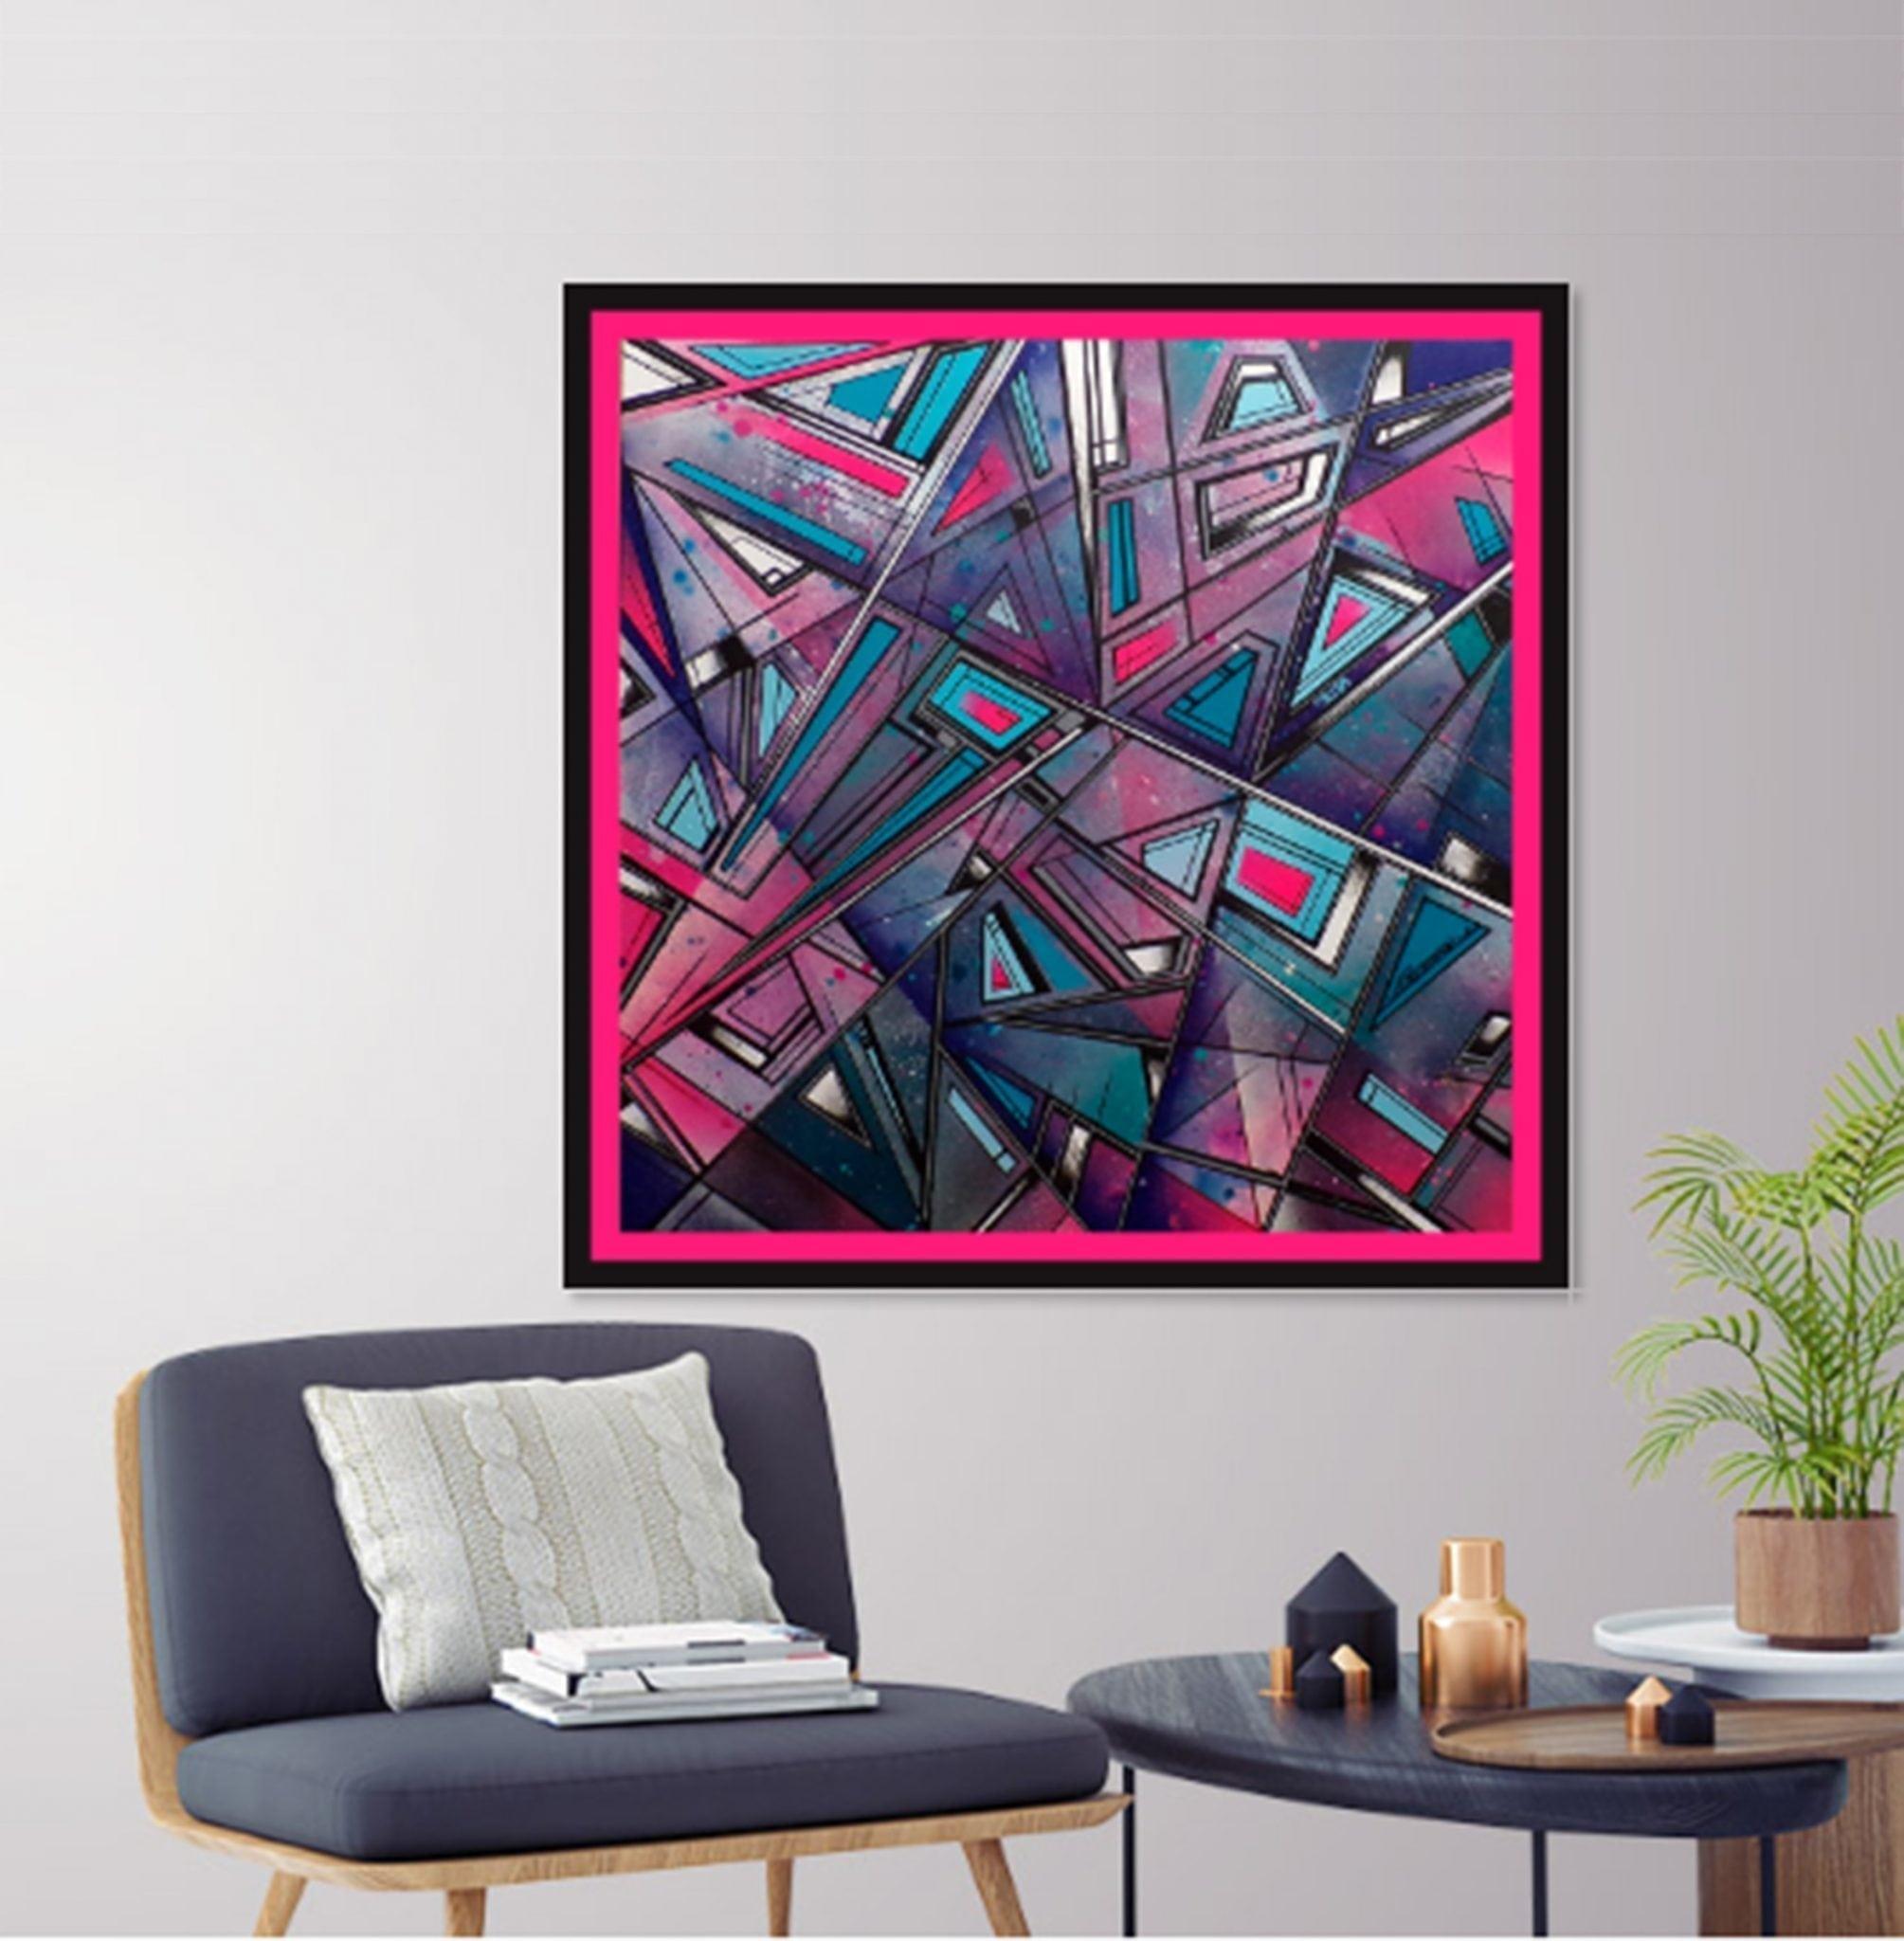 Streetskate 1 -An abstract geometric painting, insitu image